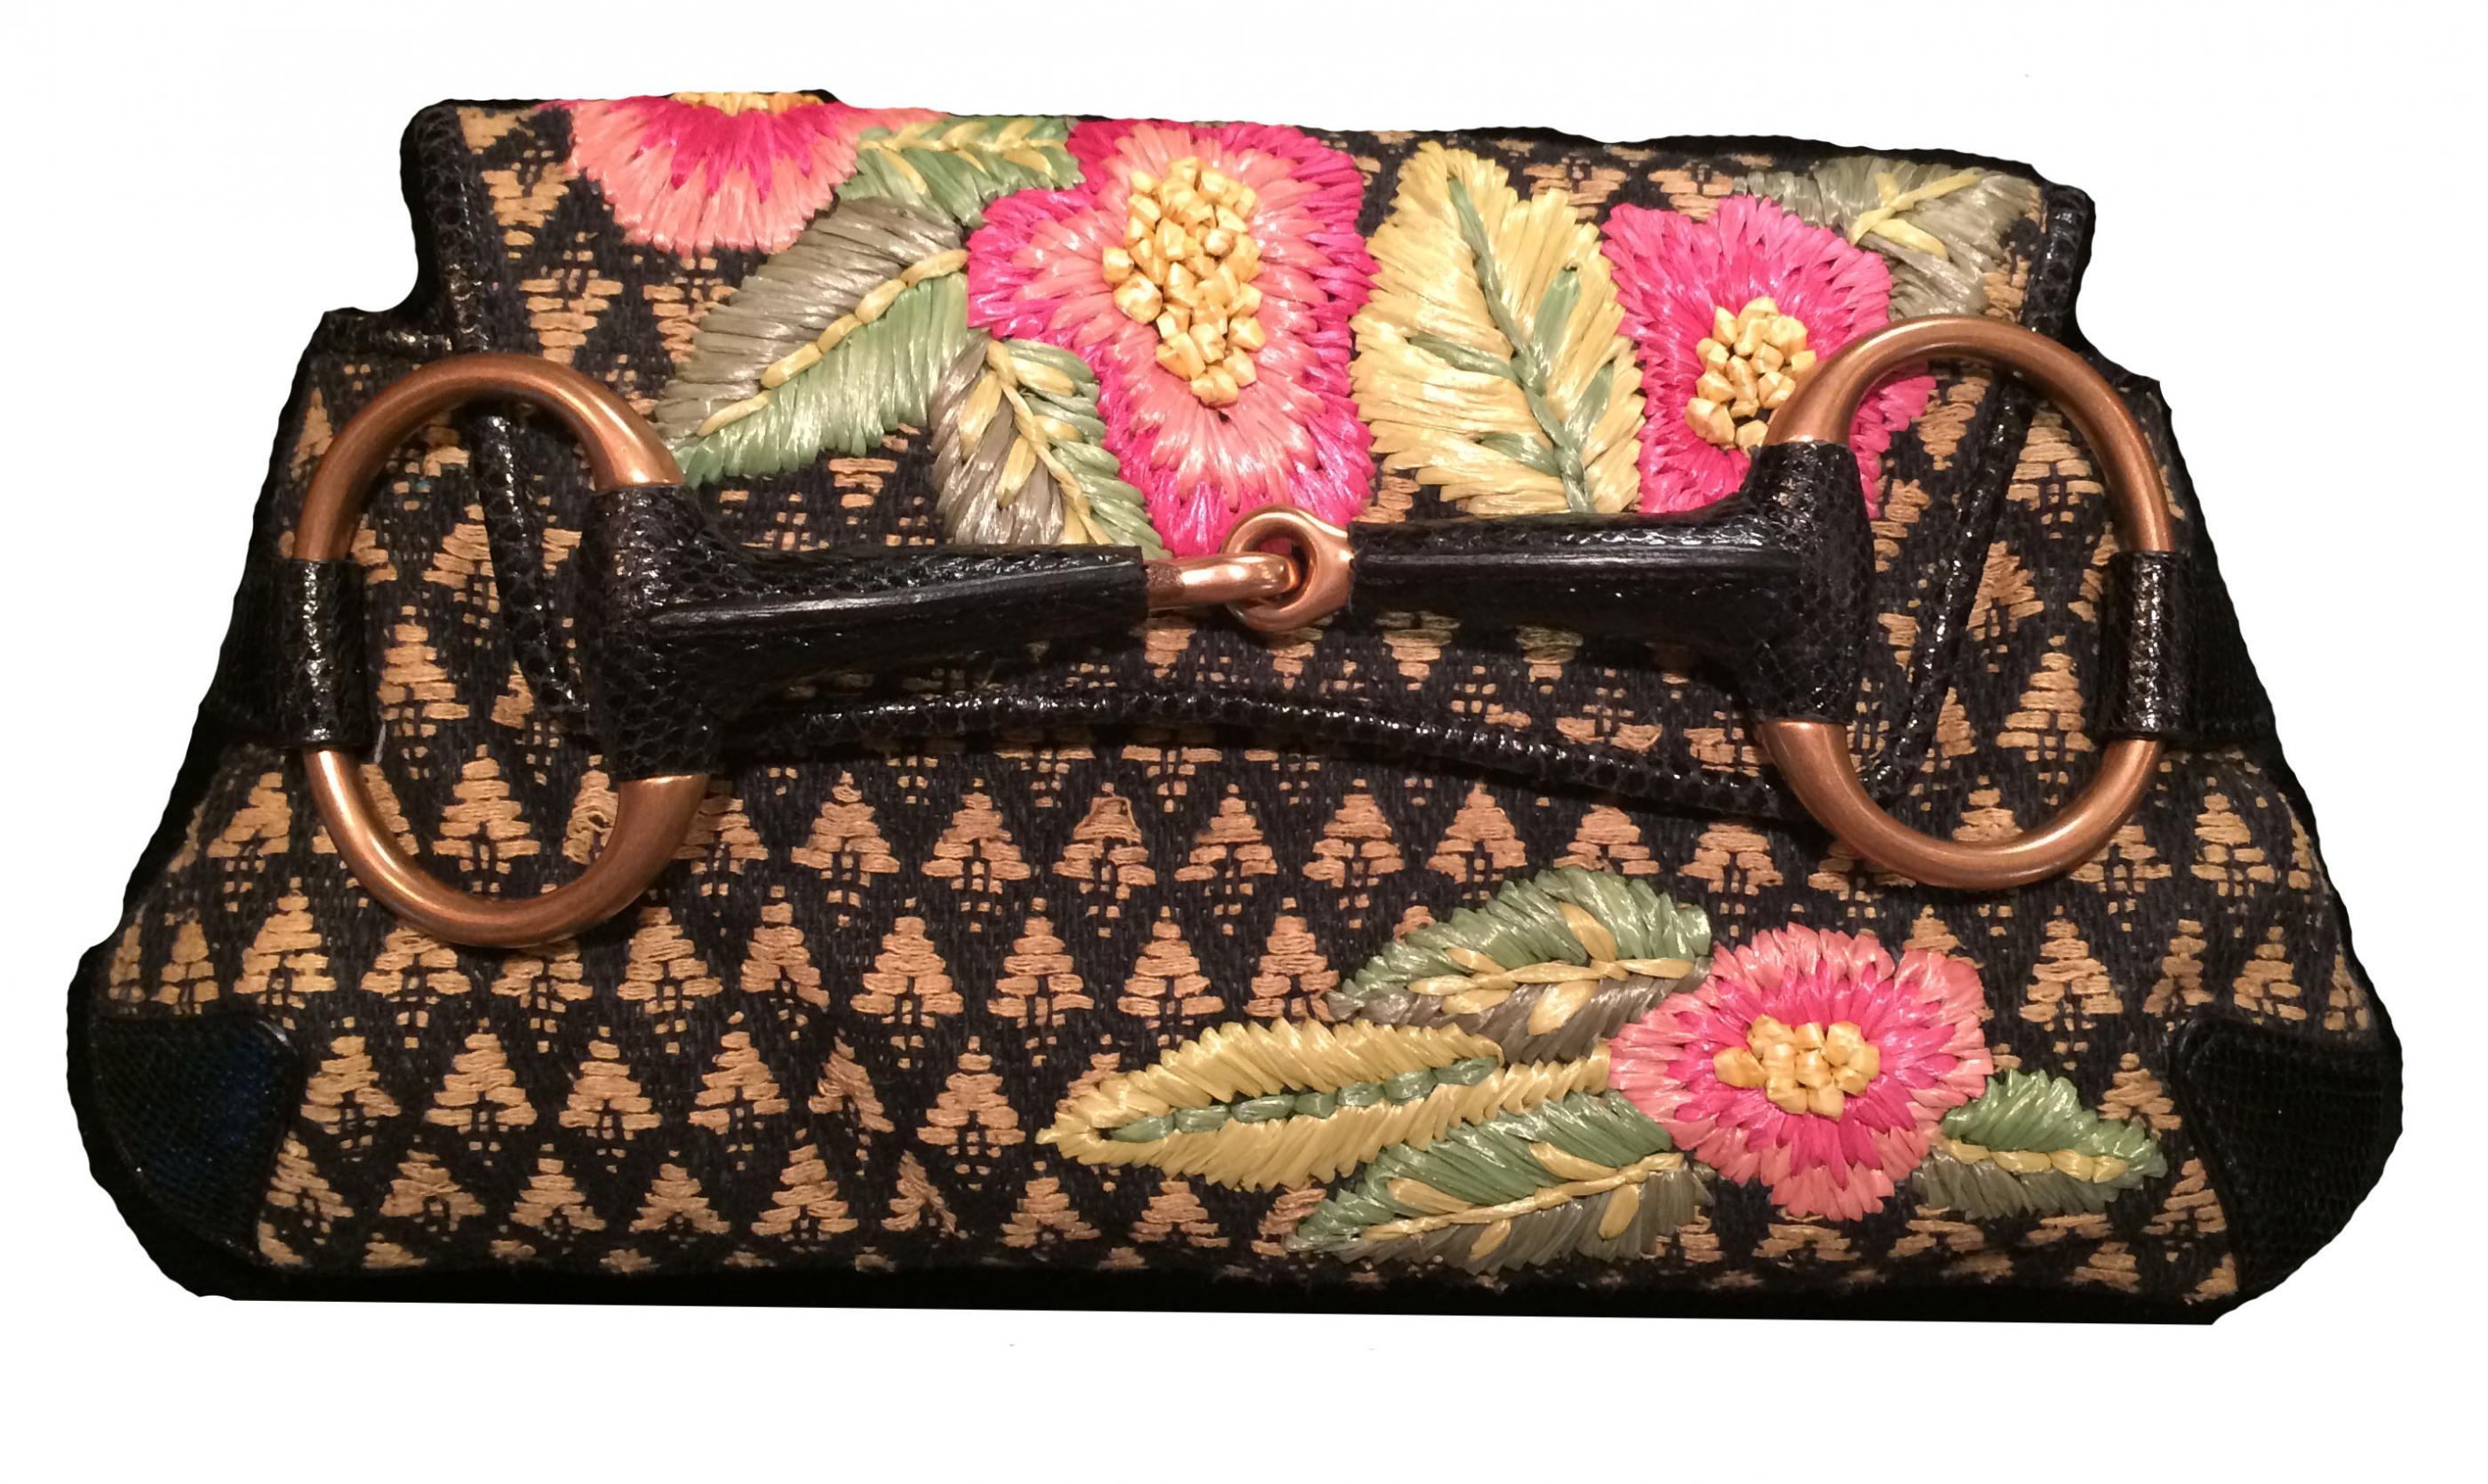 Gucci Embroidered Rafia Flower Horsebit Handbag Modernism